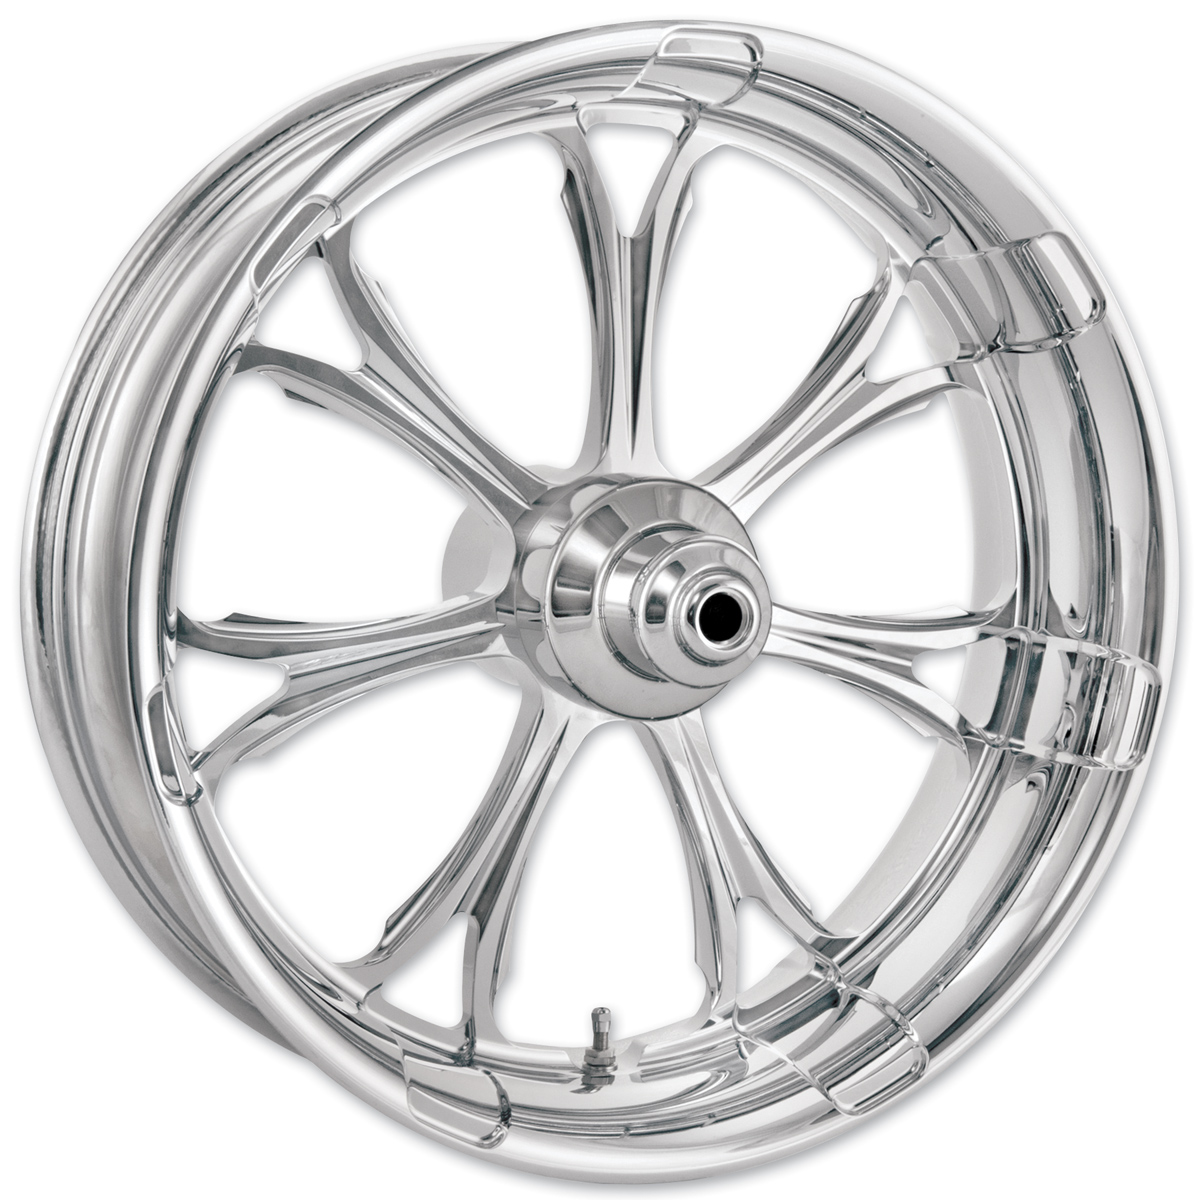 Performance Machine Paramount Chrome Front Wheel 19x3 ABS